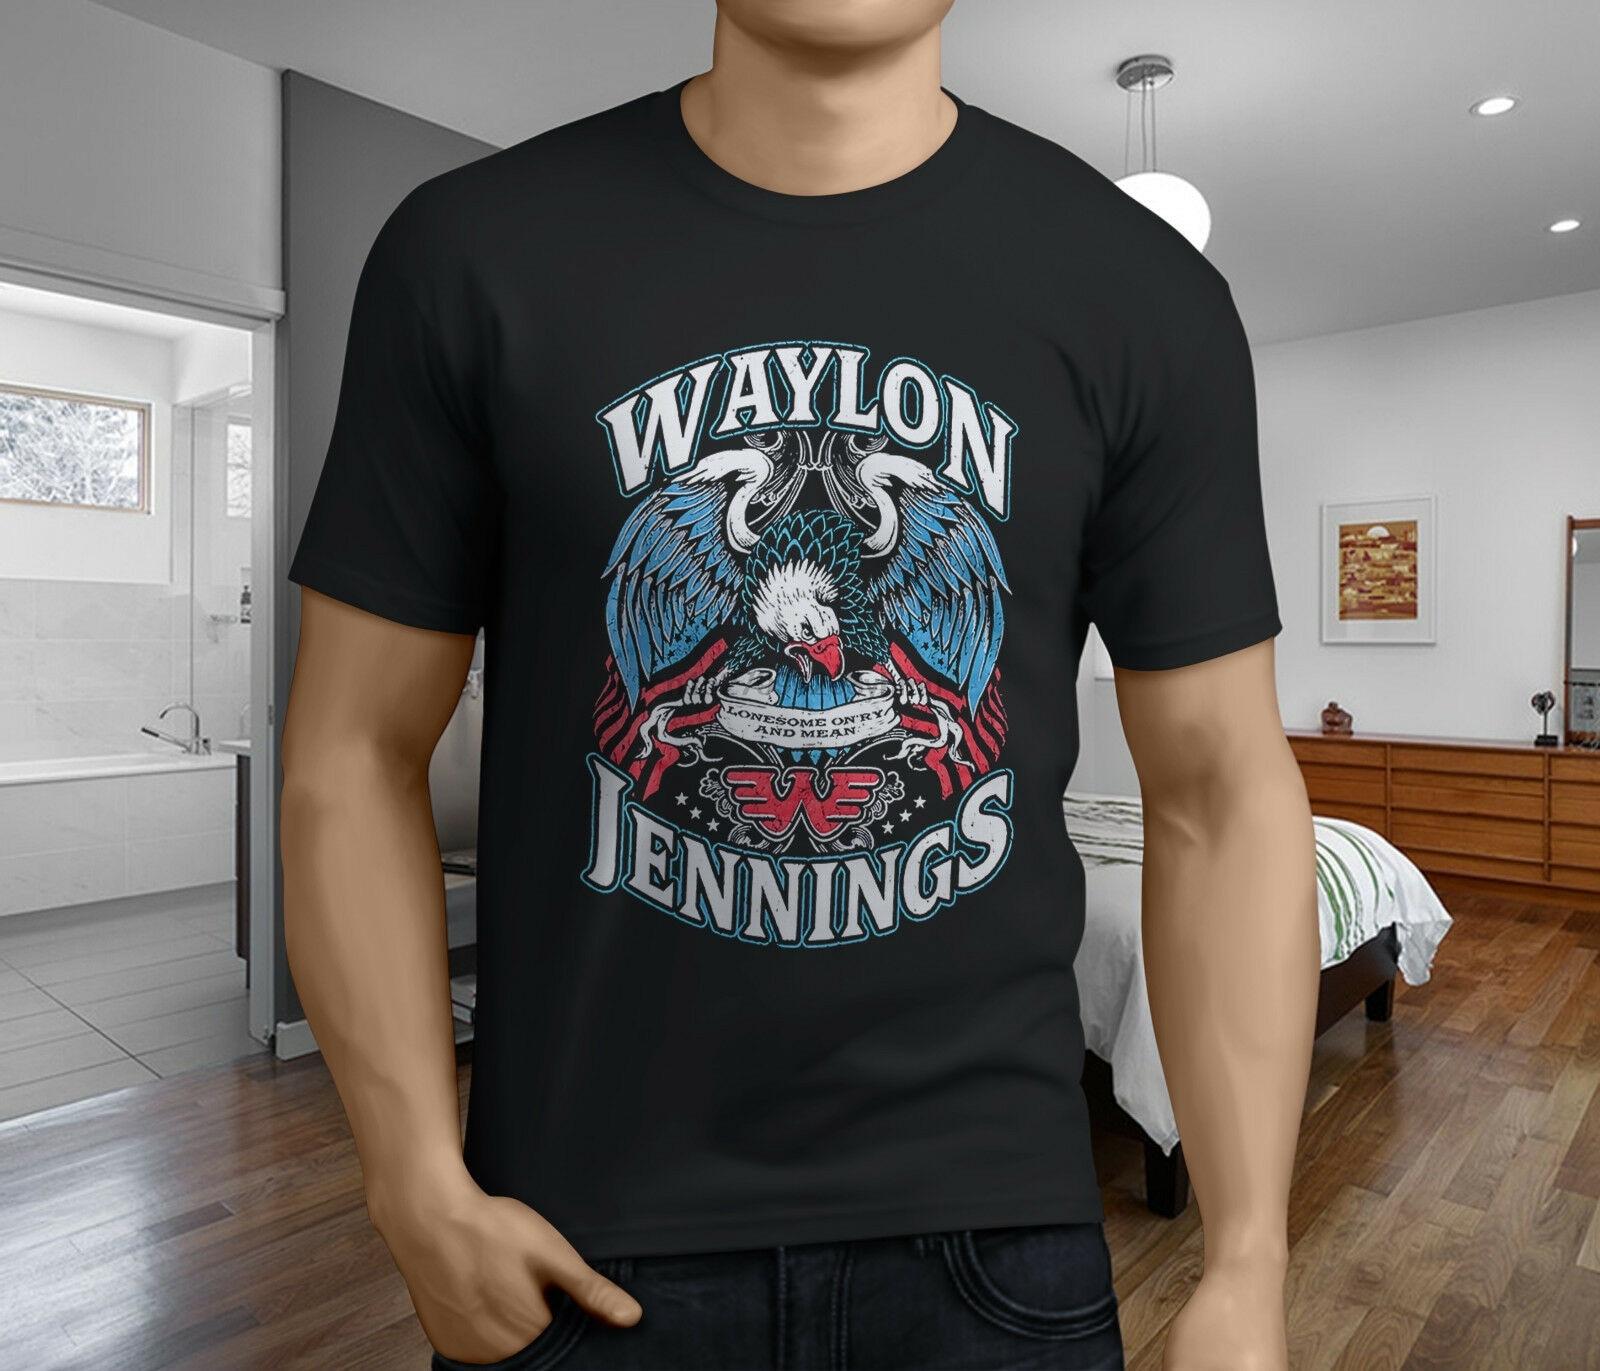 Nueva y Popular camiseta negra para hombre WAYLON jenns LONESOME SINGER MUSIC BAND S-3XL